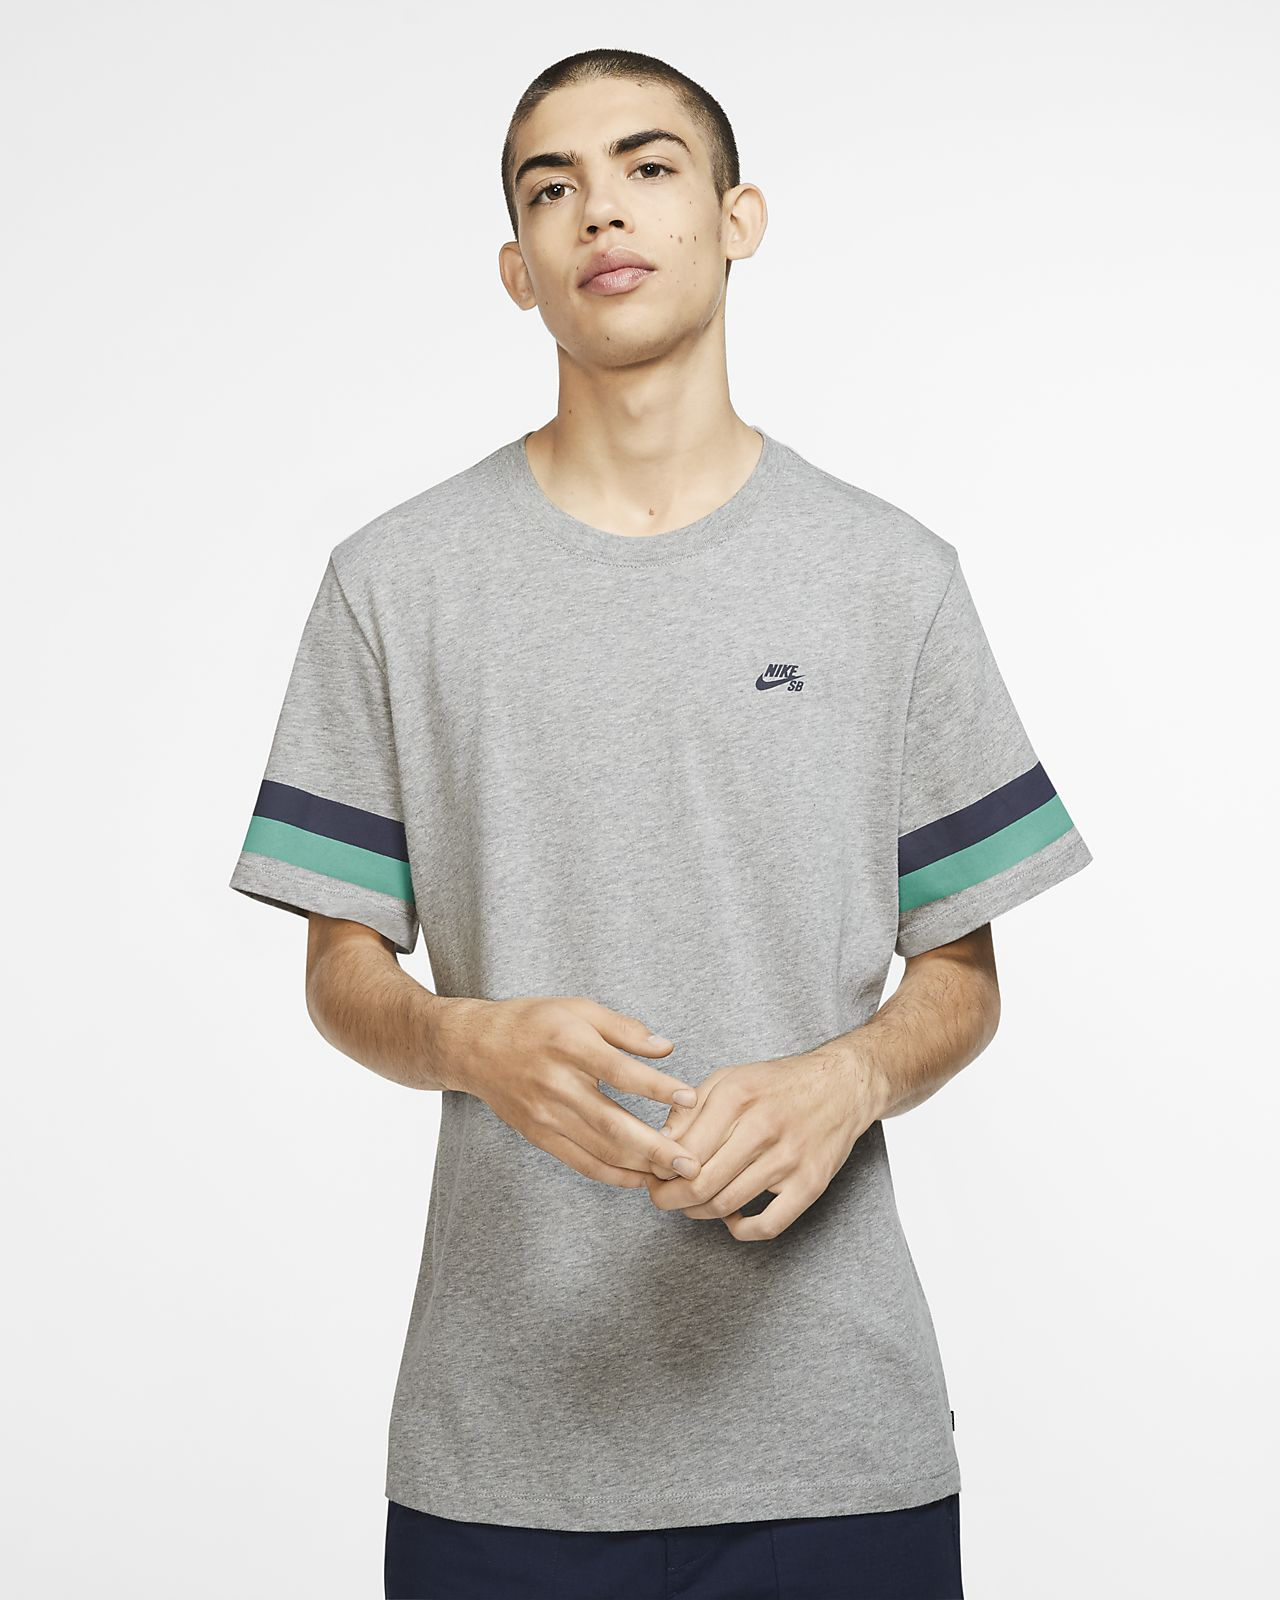 7c0d454694 Tee-shirt de skateboard à rayures Nike SB pour Homme. Nike.com CA